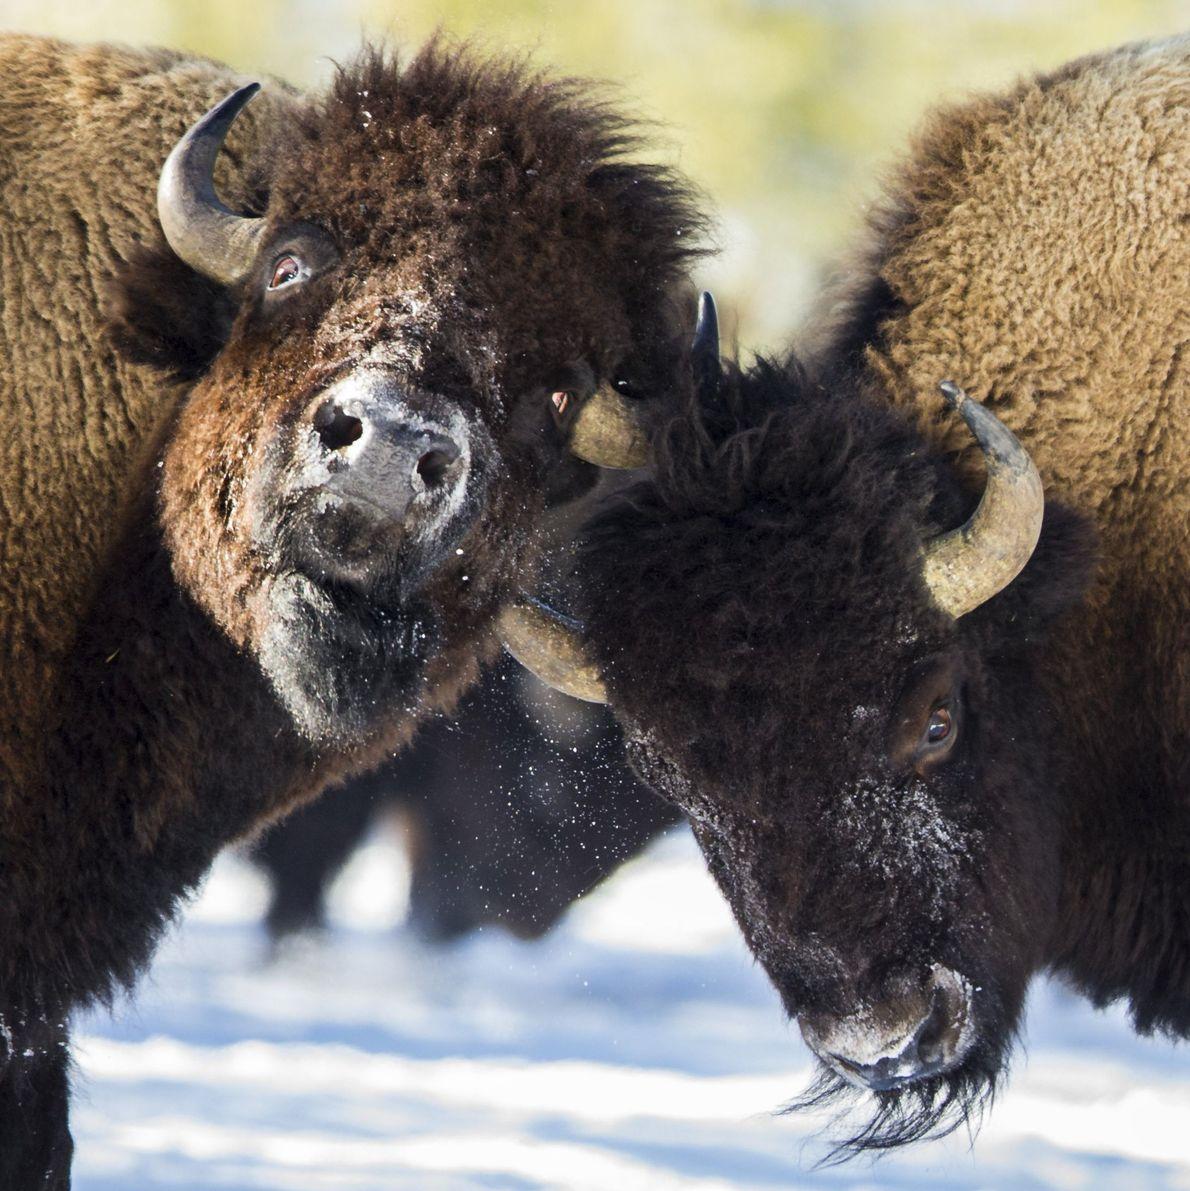 Dois bisontes em disputa